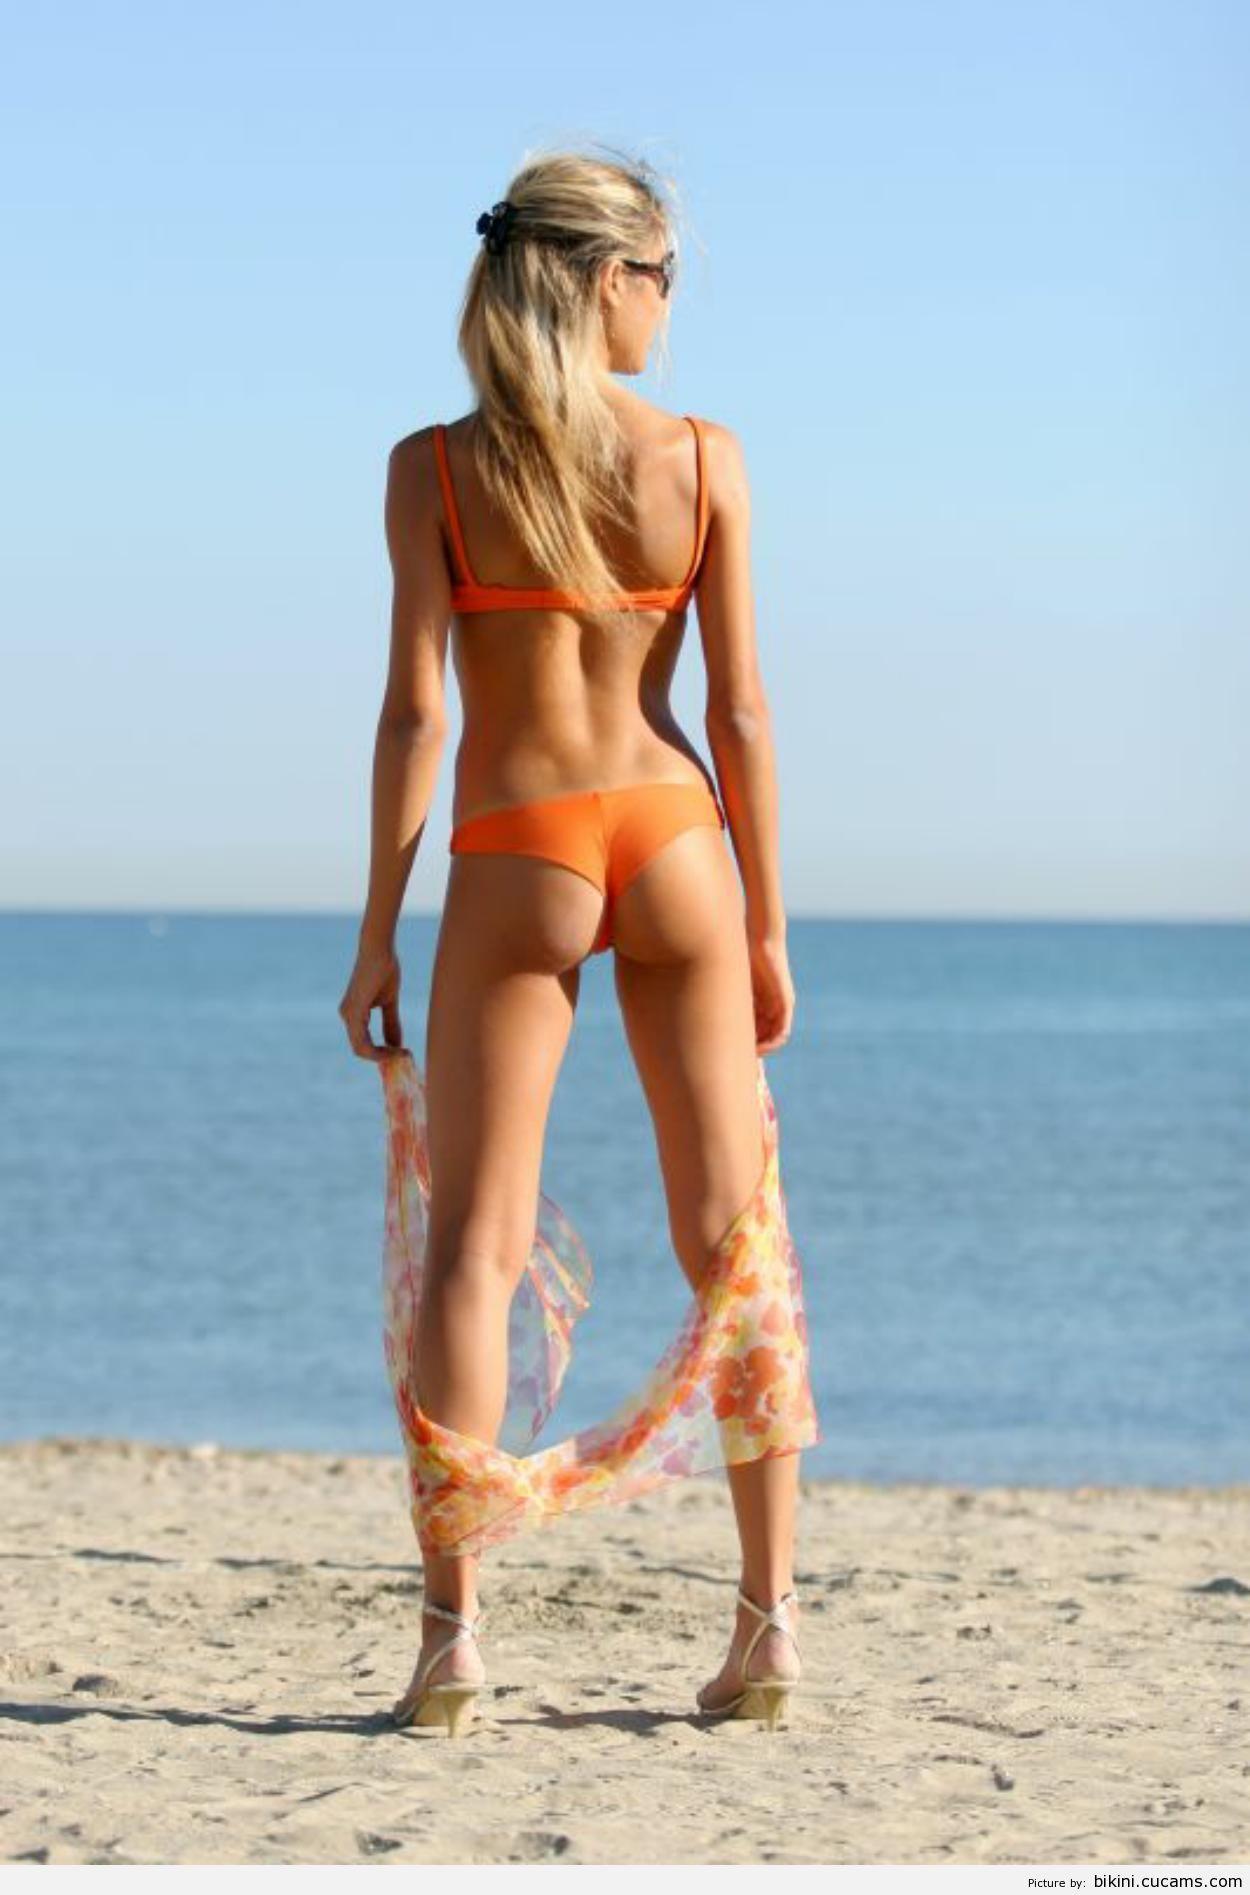 Bikini Tiny Cum by bikini.cucams.com